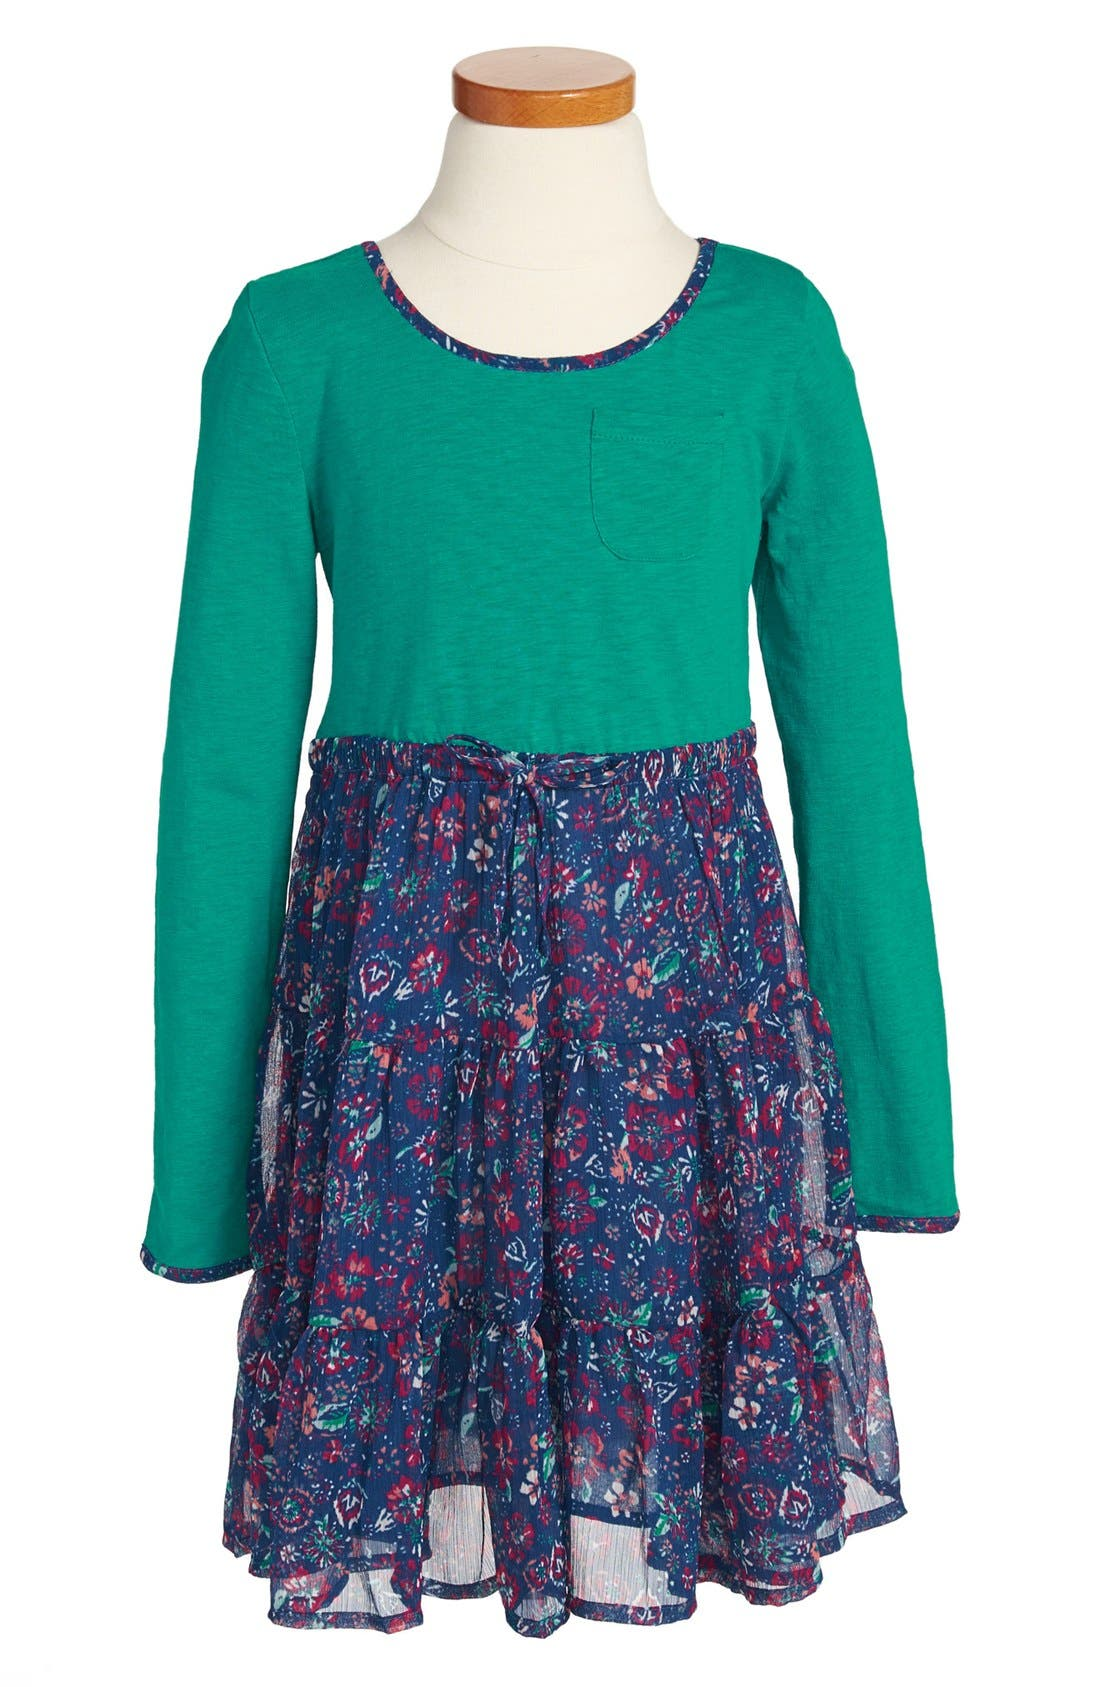 Alternate Image 1 Selected - Roxy 'Sandy Footprints' Dress (Toddler Girls)